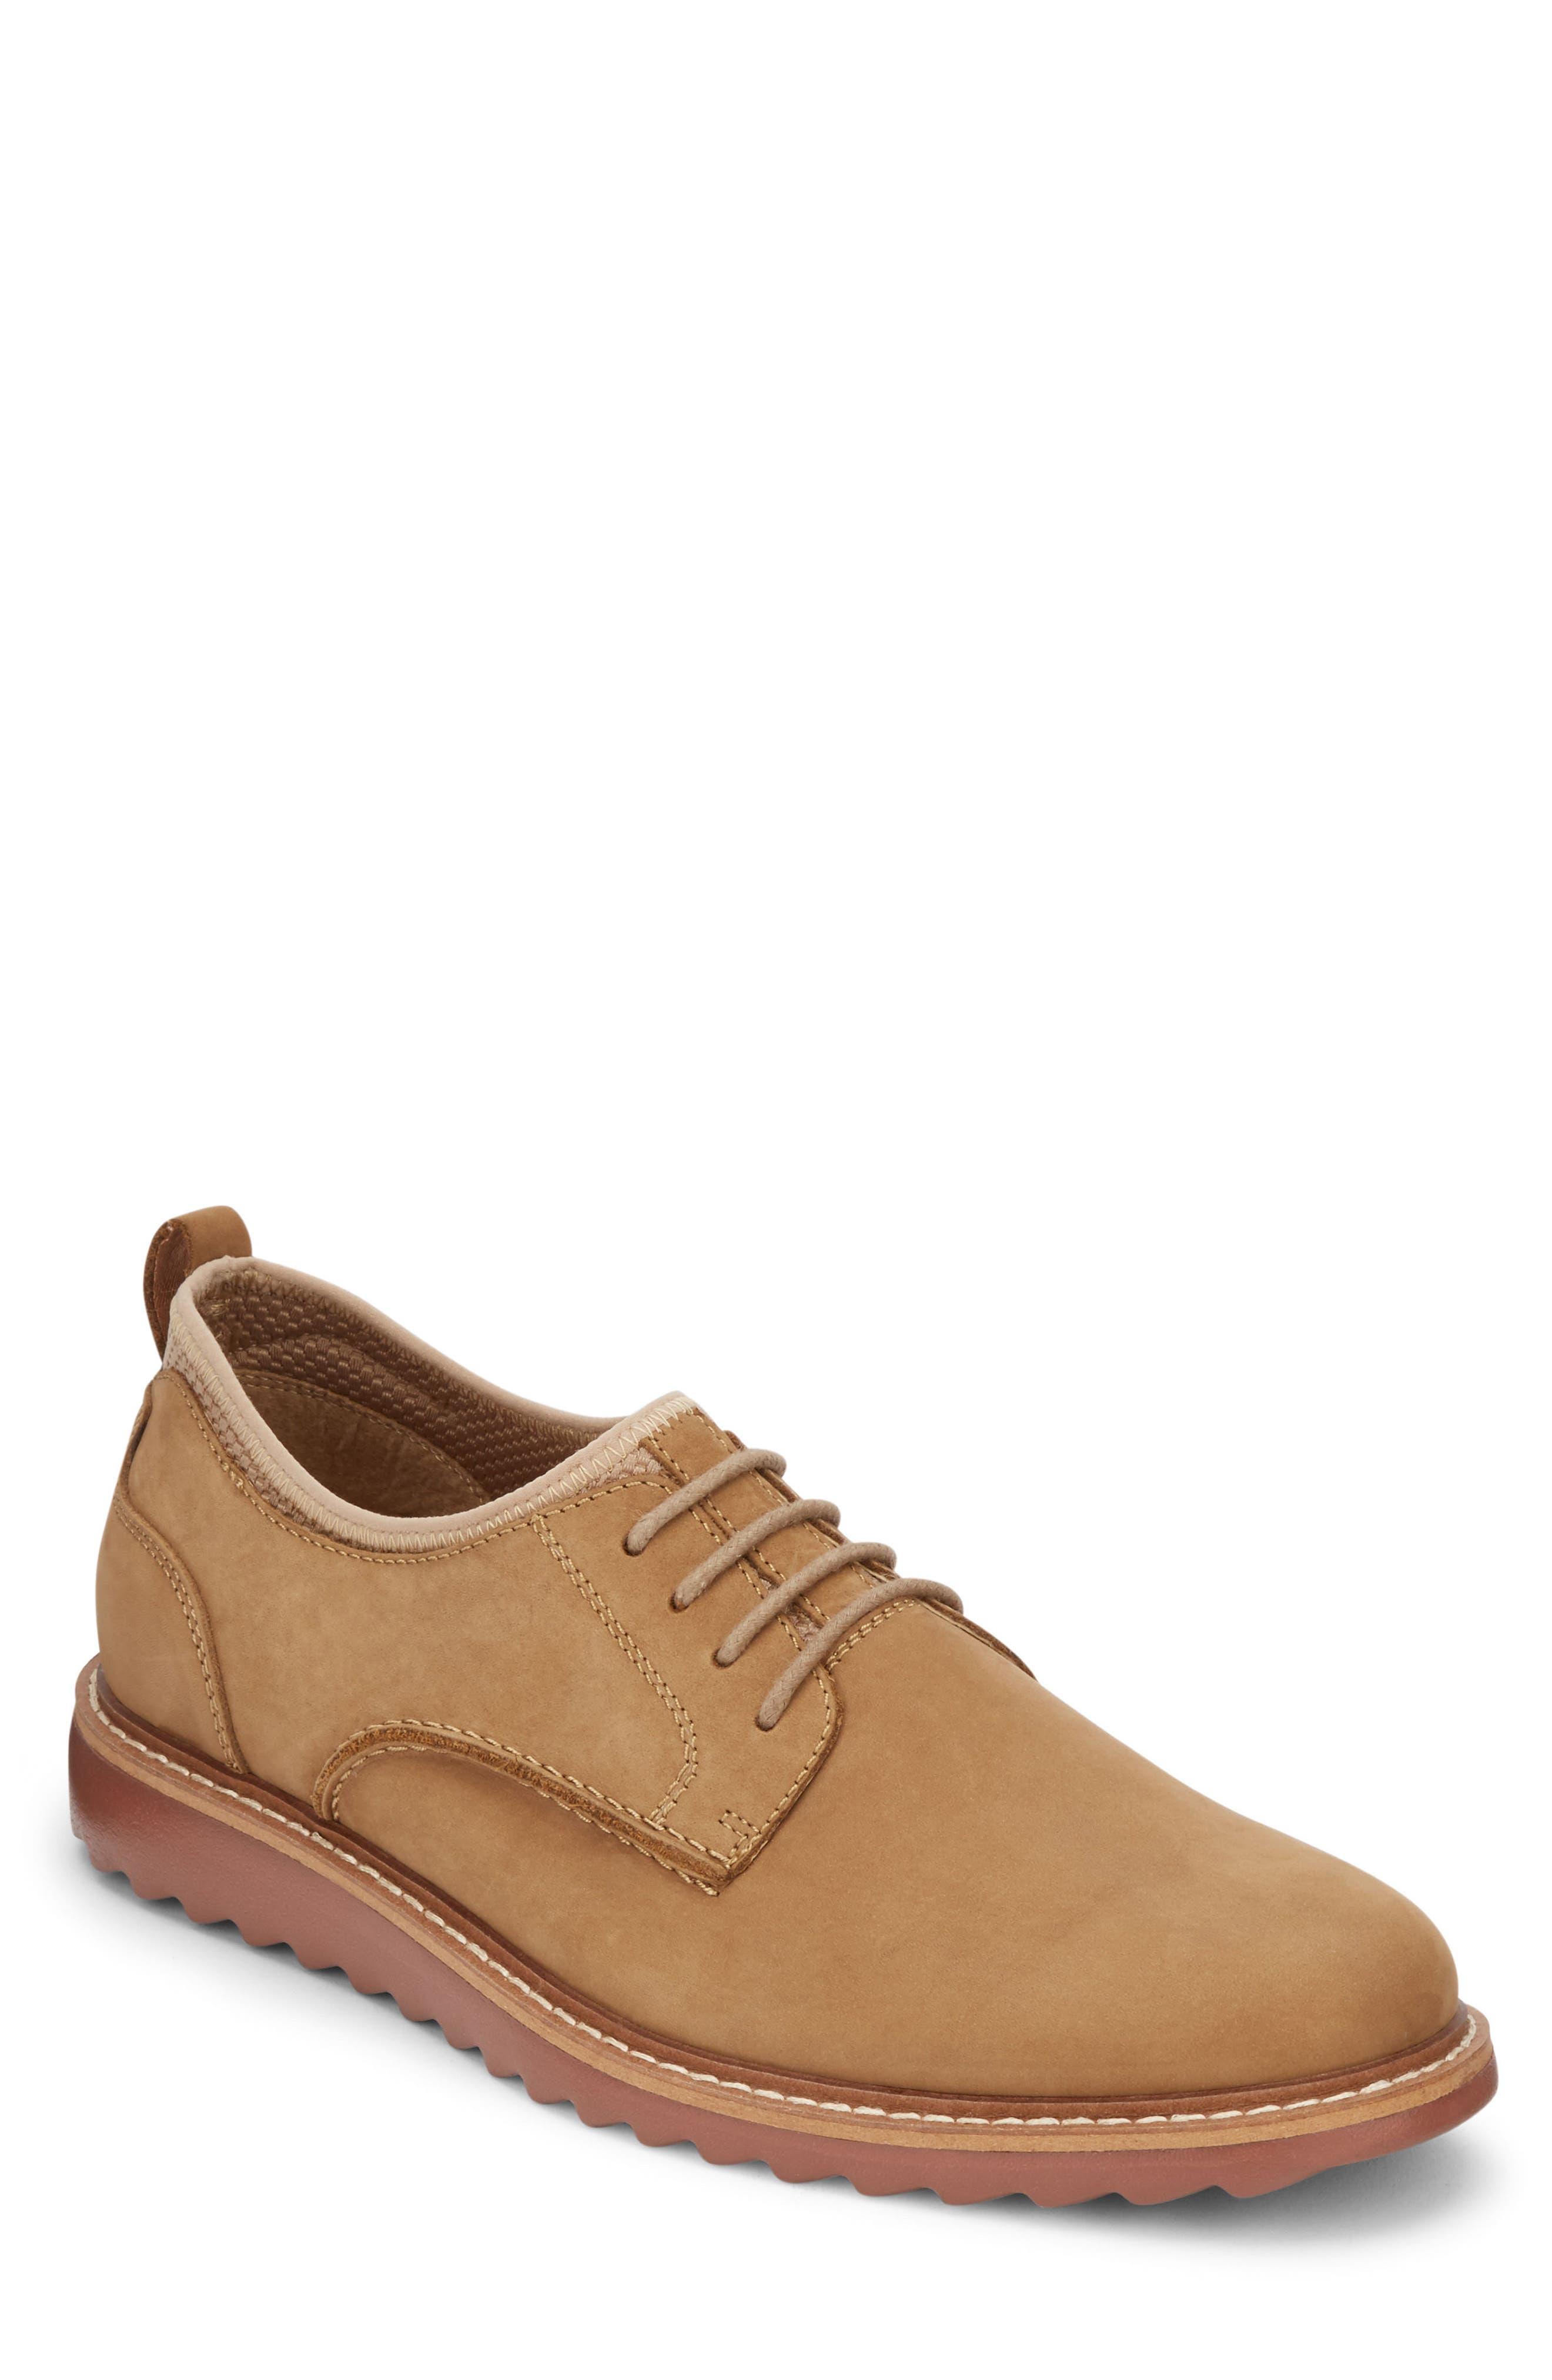 G.H. BASS & CO. Buck 2.0 Plain Toe Derby, Main, color, BROWN NUBUCK